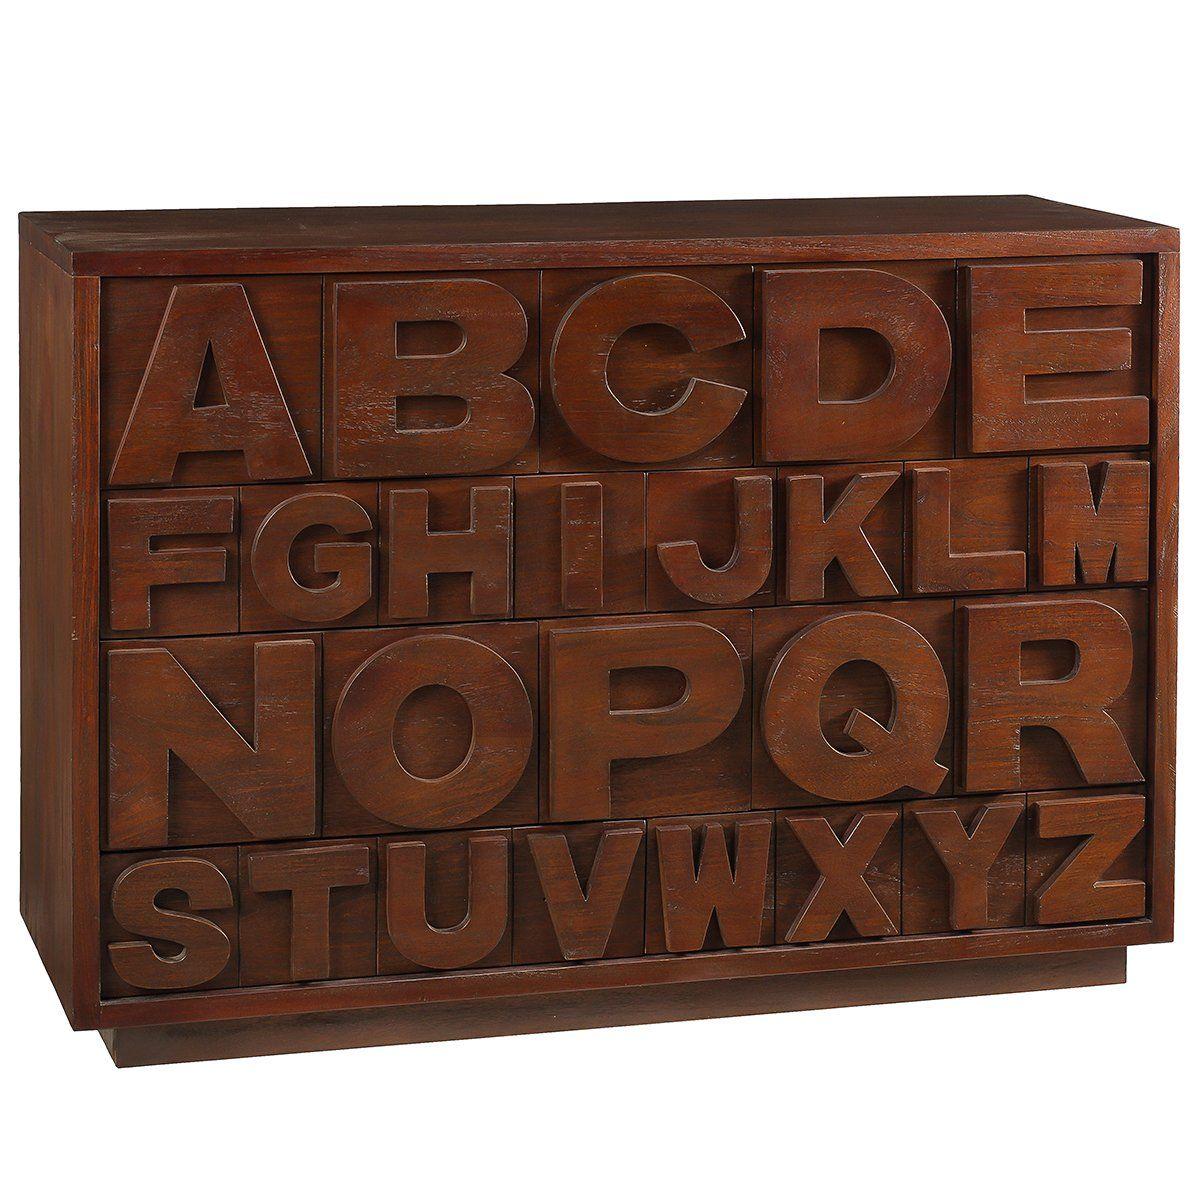 Size48 Wde X 34 Deep X 17 Price 596 00 Mahogany Alphabet Novelty Sign